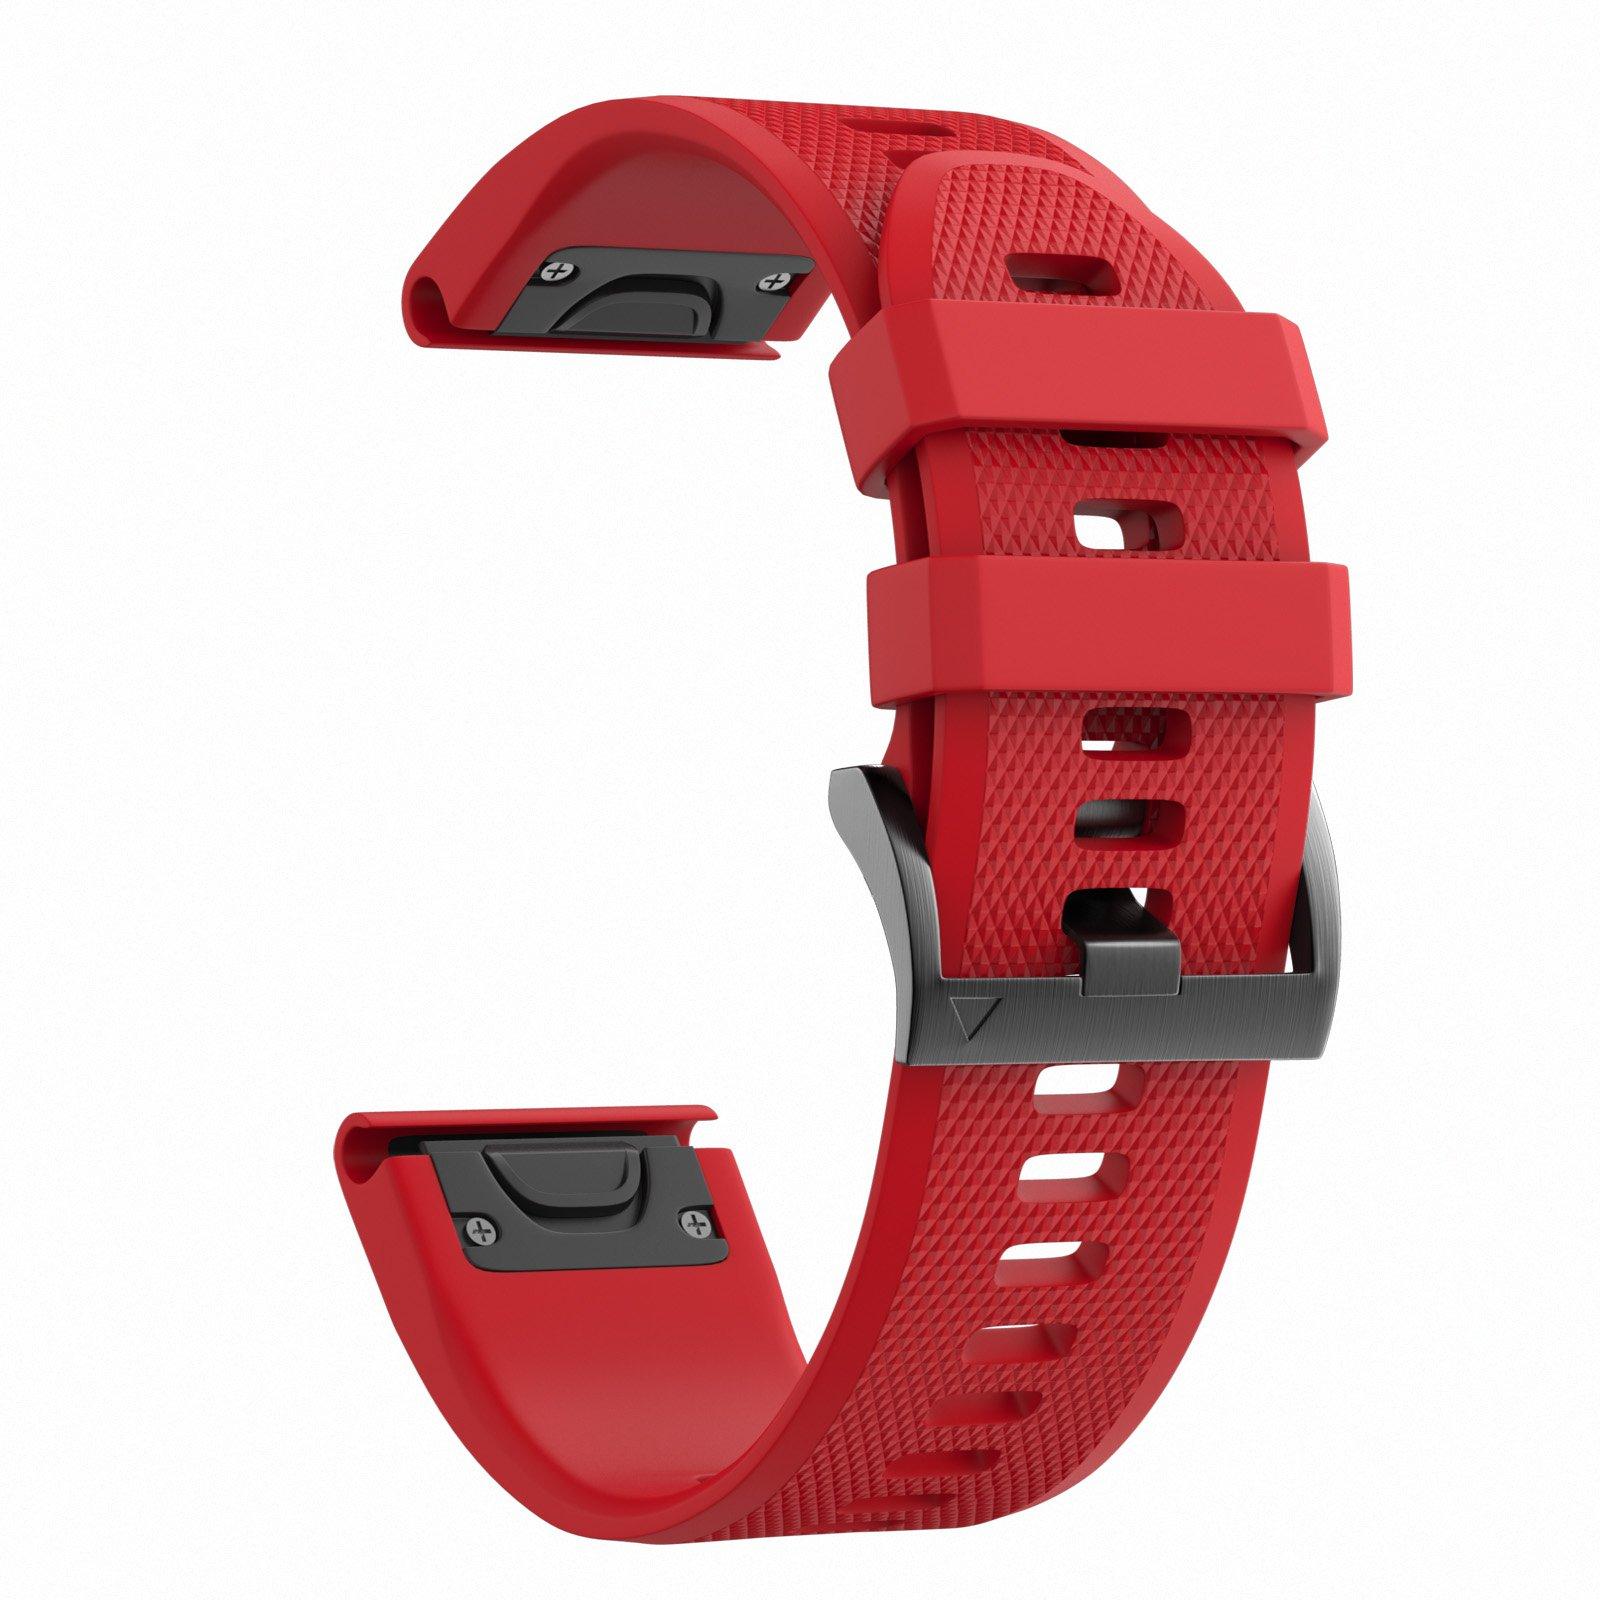 Notocity Compatible Fenix 5X Band 26mm Width Soft Silicone Watch Strap for Fenix 5X Plus/Fenix 6X/Fenix 6X Pro/Fenix 3/Fenix 3 HR/Descent MK1/D2 Delta PX/D2 Charlie-Red by NotoCity